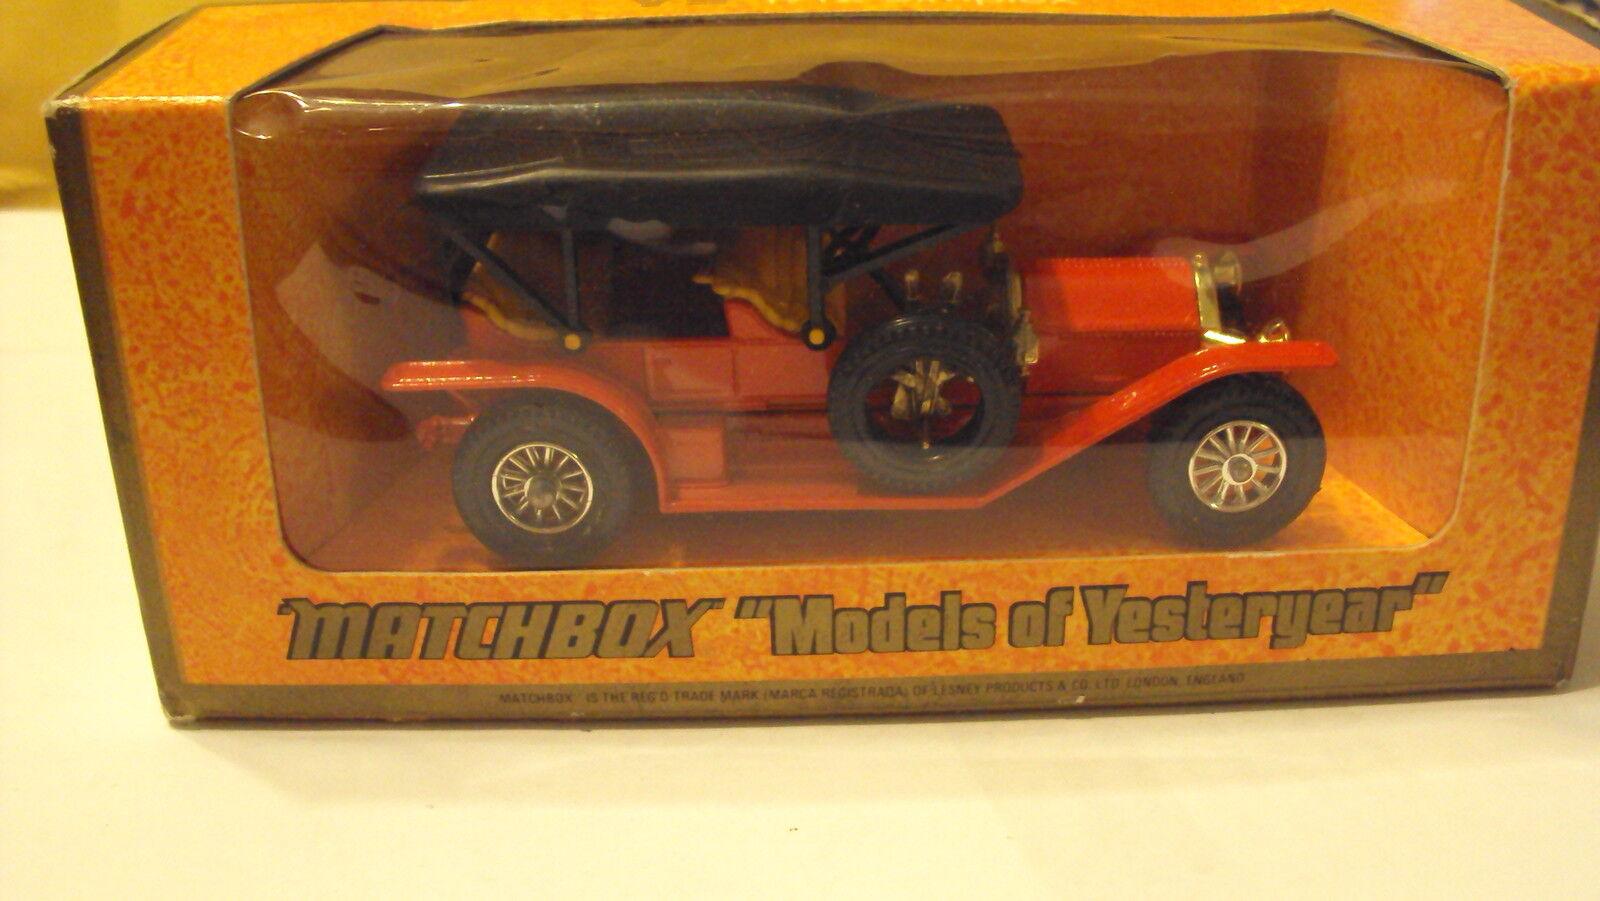 Matchbox models of yesteryear Y-9 SIMPLEX MOY Near Comme neuf